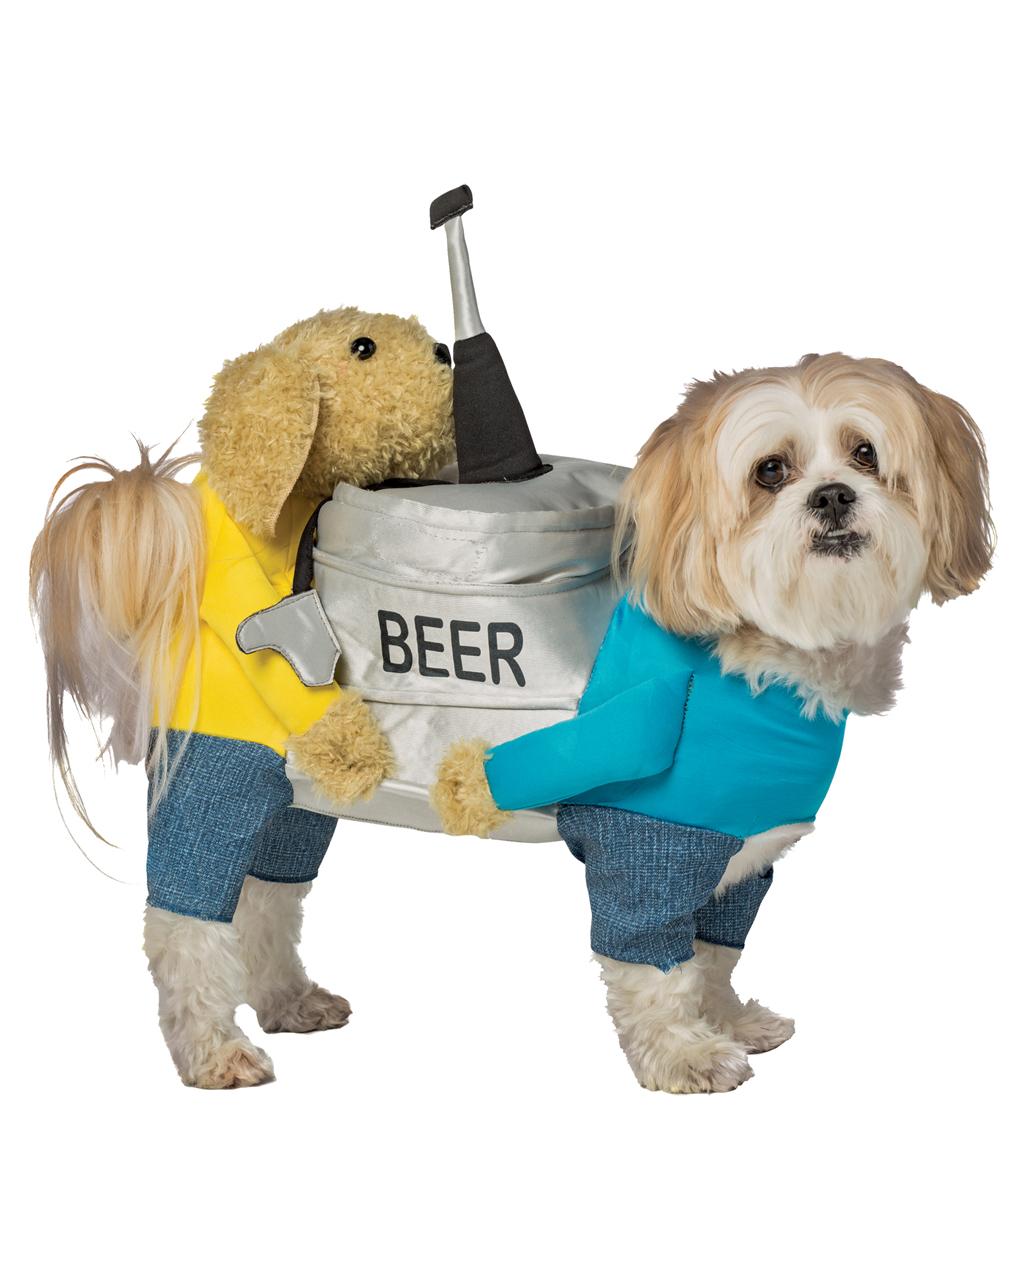 Bierfass Kostum Fur Hunde Als Lustige Tierverkleidung Karneval